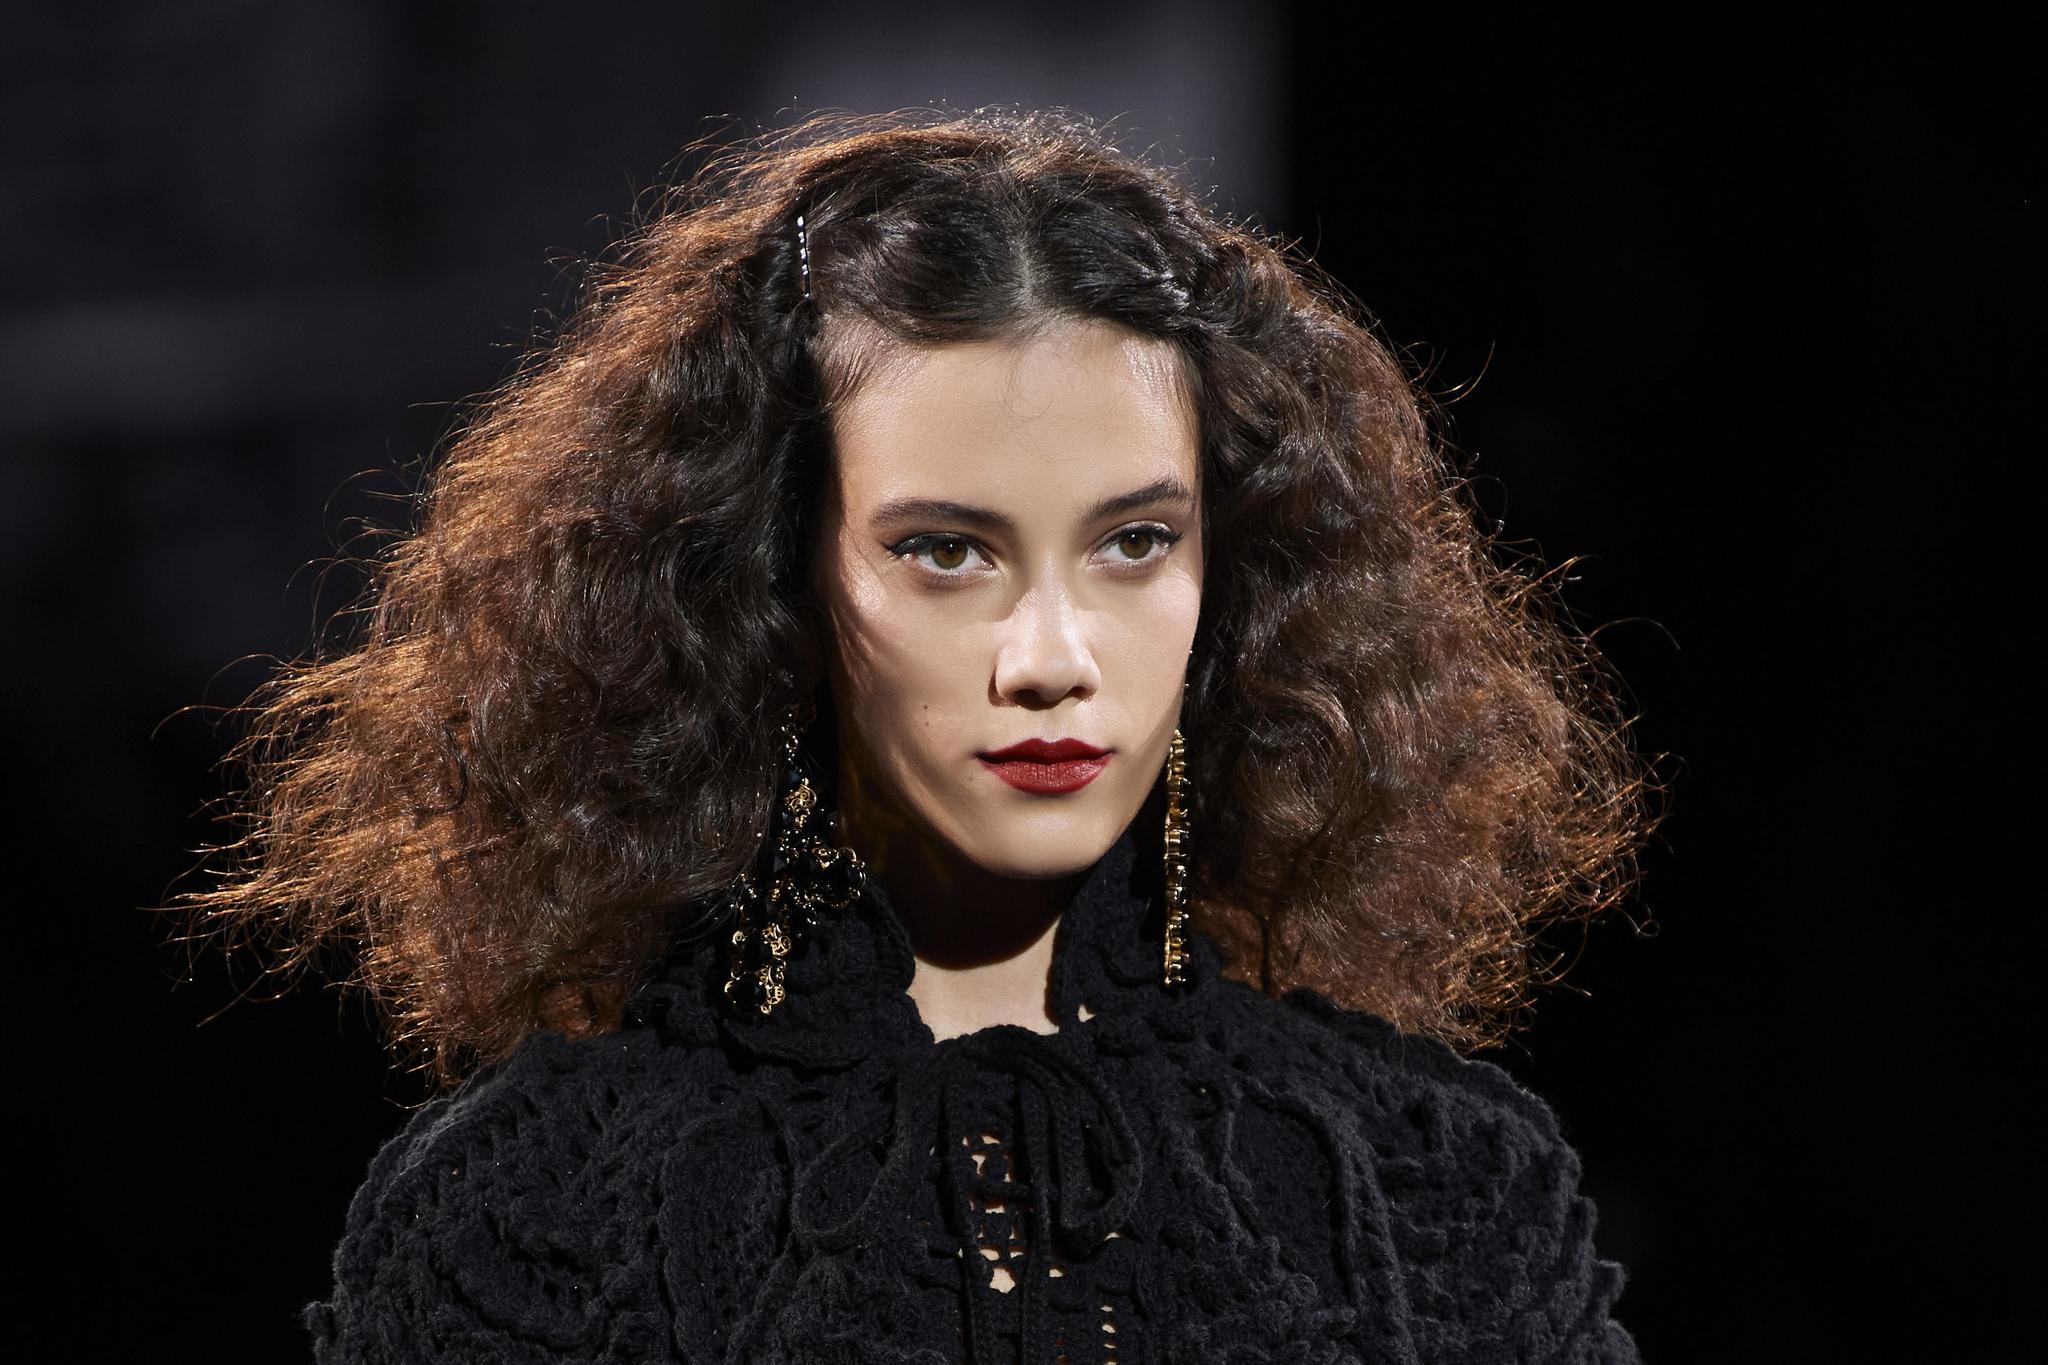 En 2021, se llevarán las melenas semilargas tanto en pelo rizado como en pelo liso.